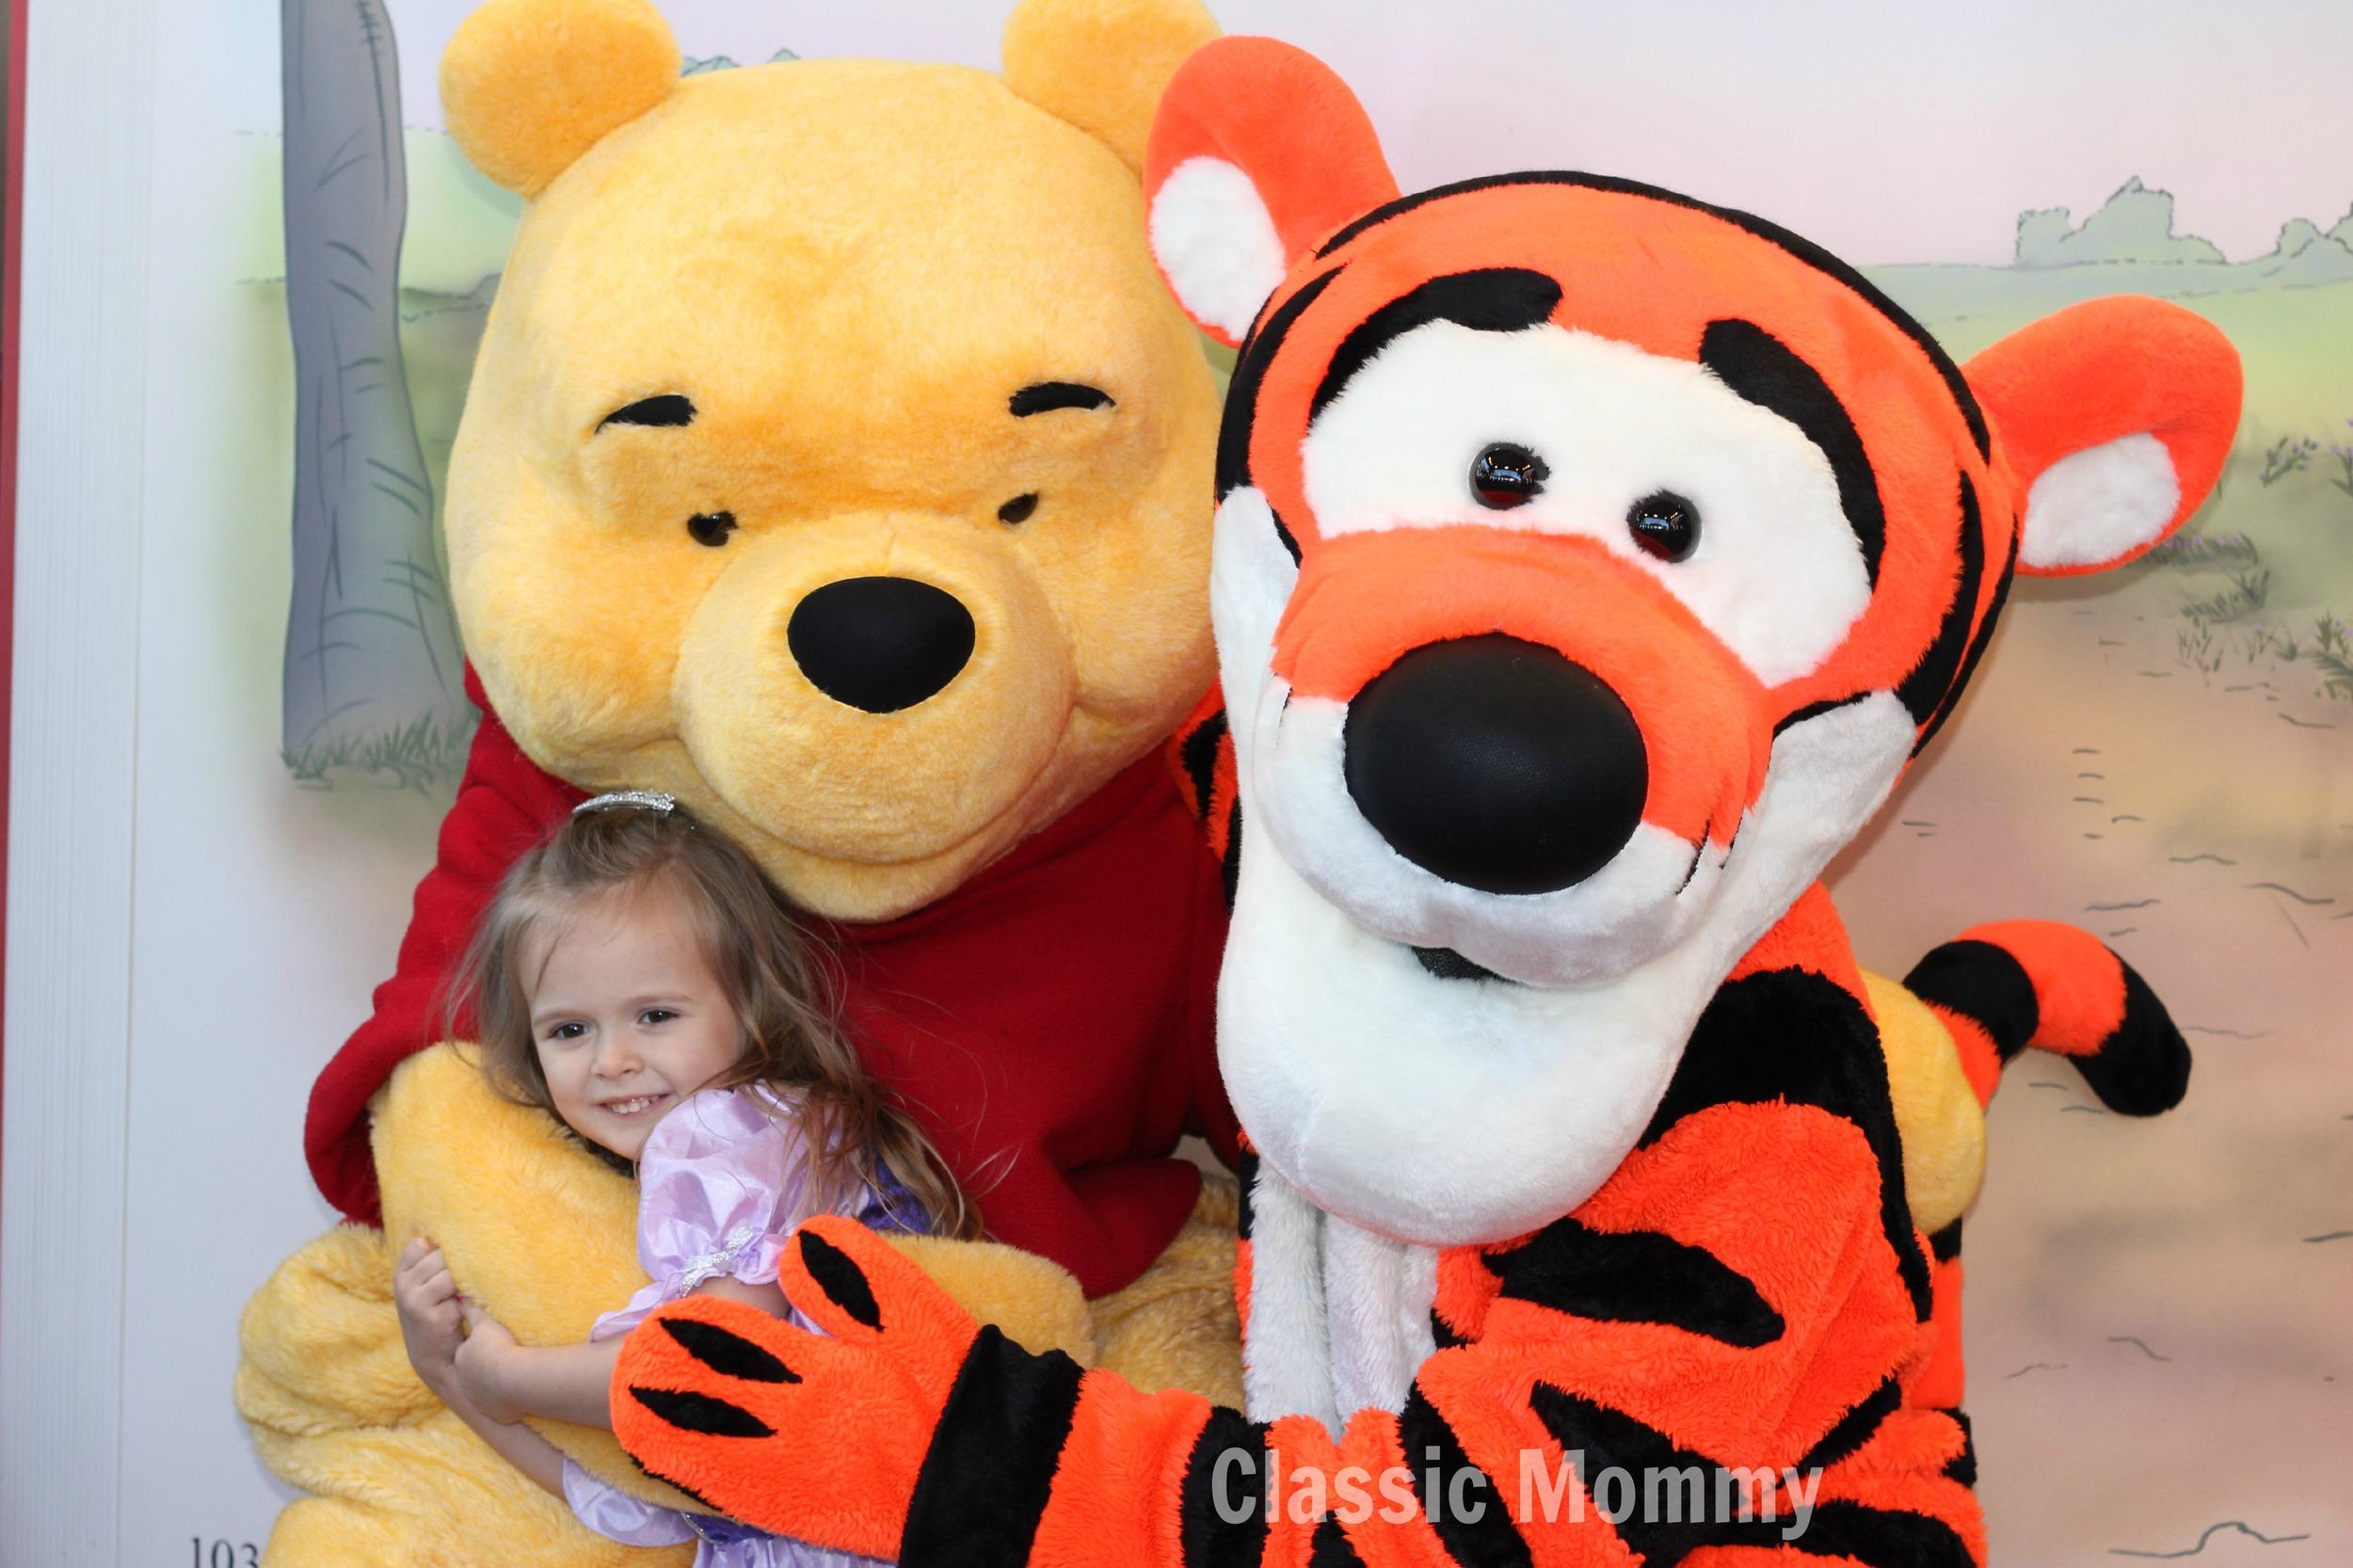 Disney Character Interaction With Pooh Tigger